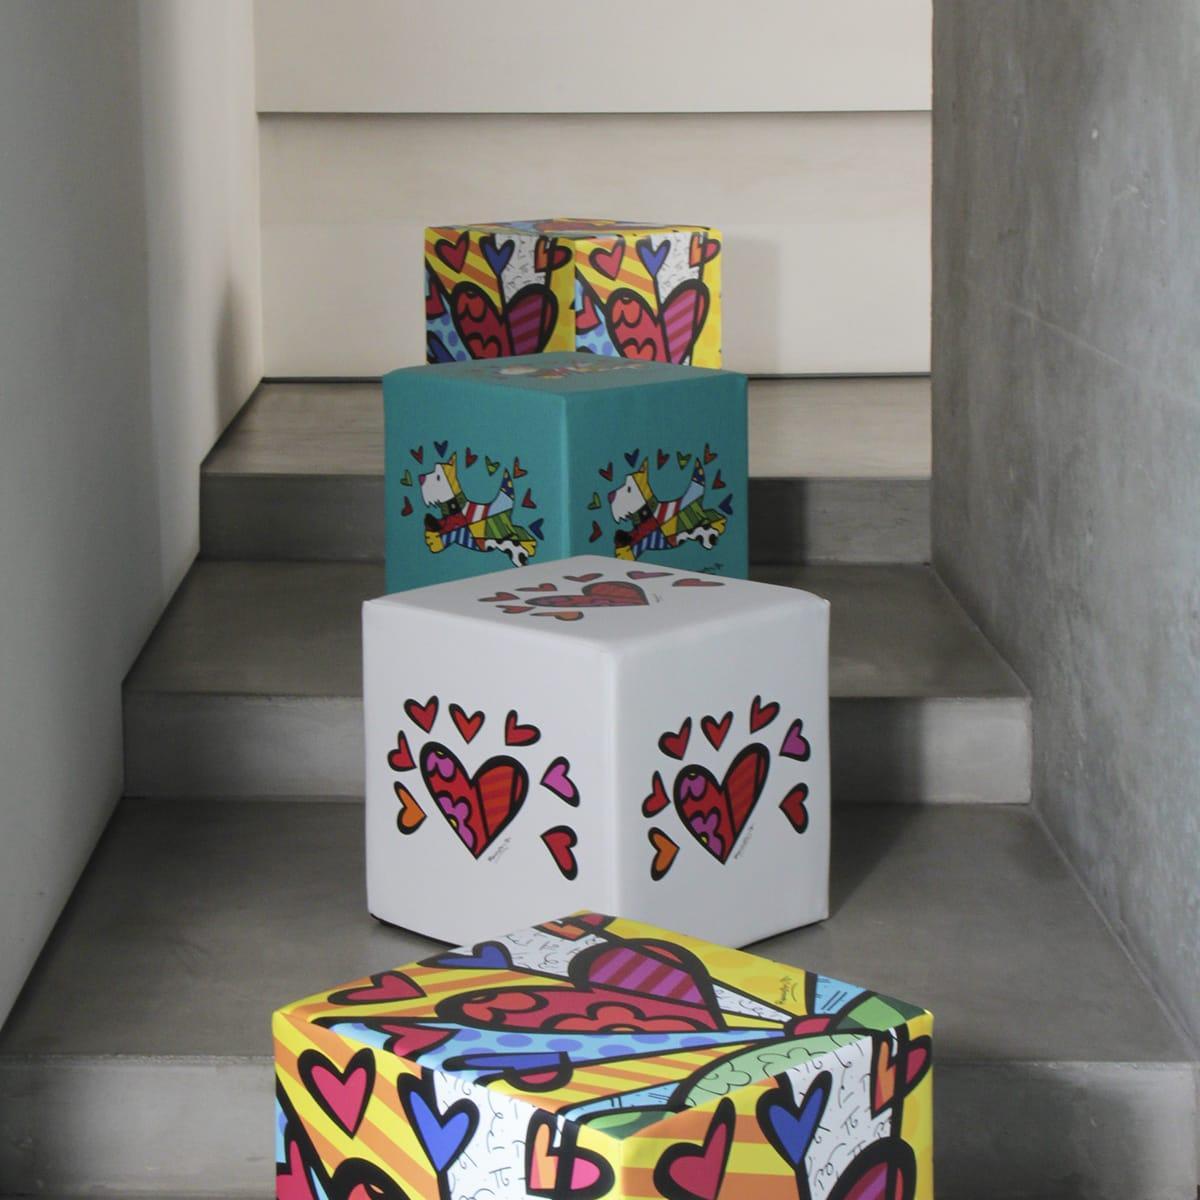 alcuni pouf cubici colorati disposti ad altezze diverse su una scala